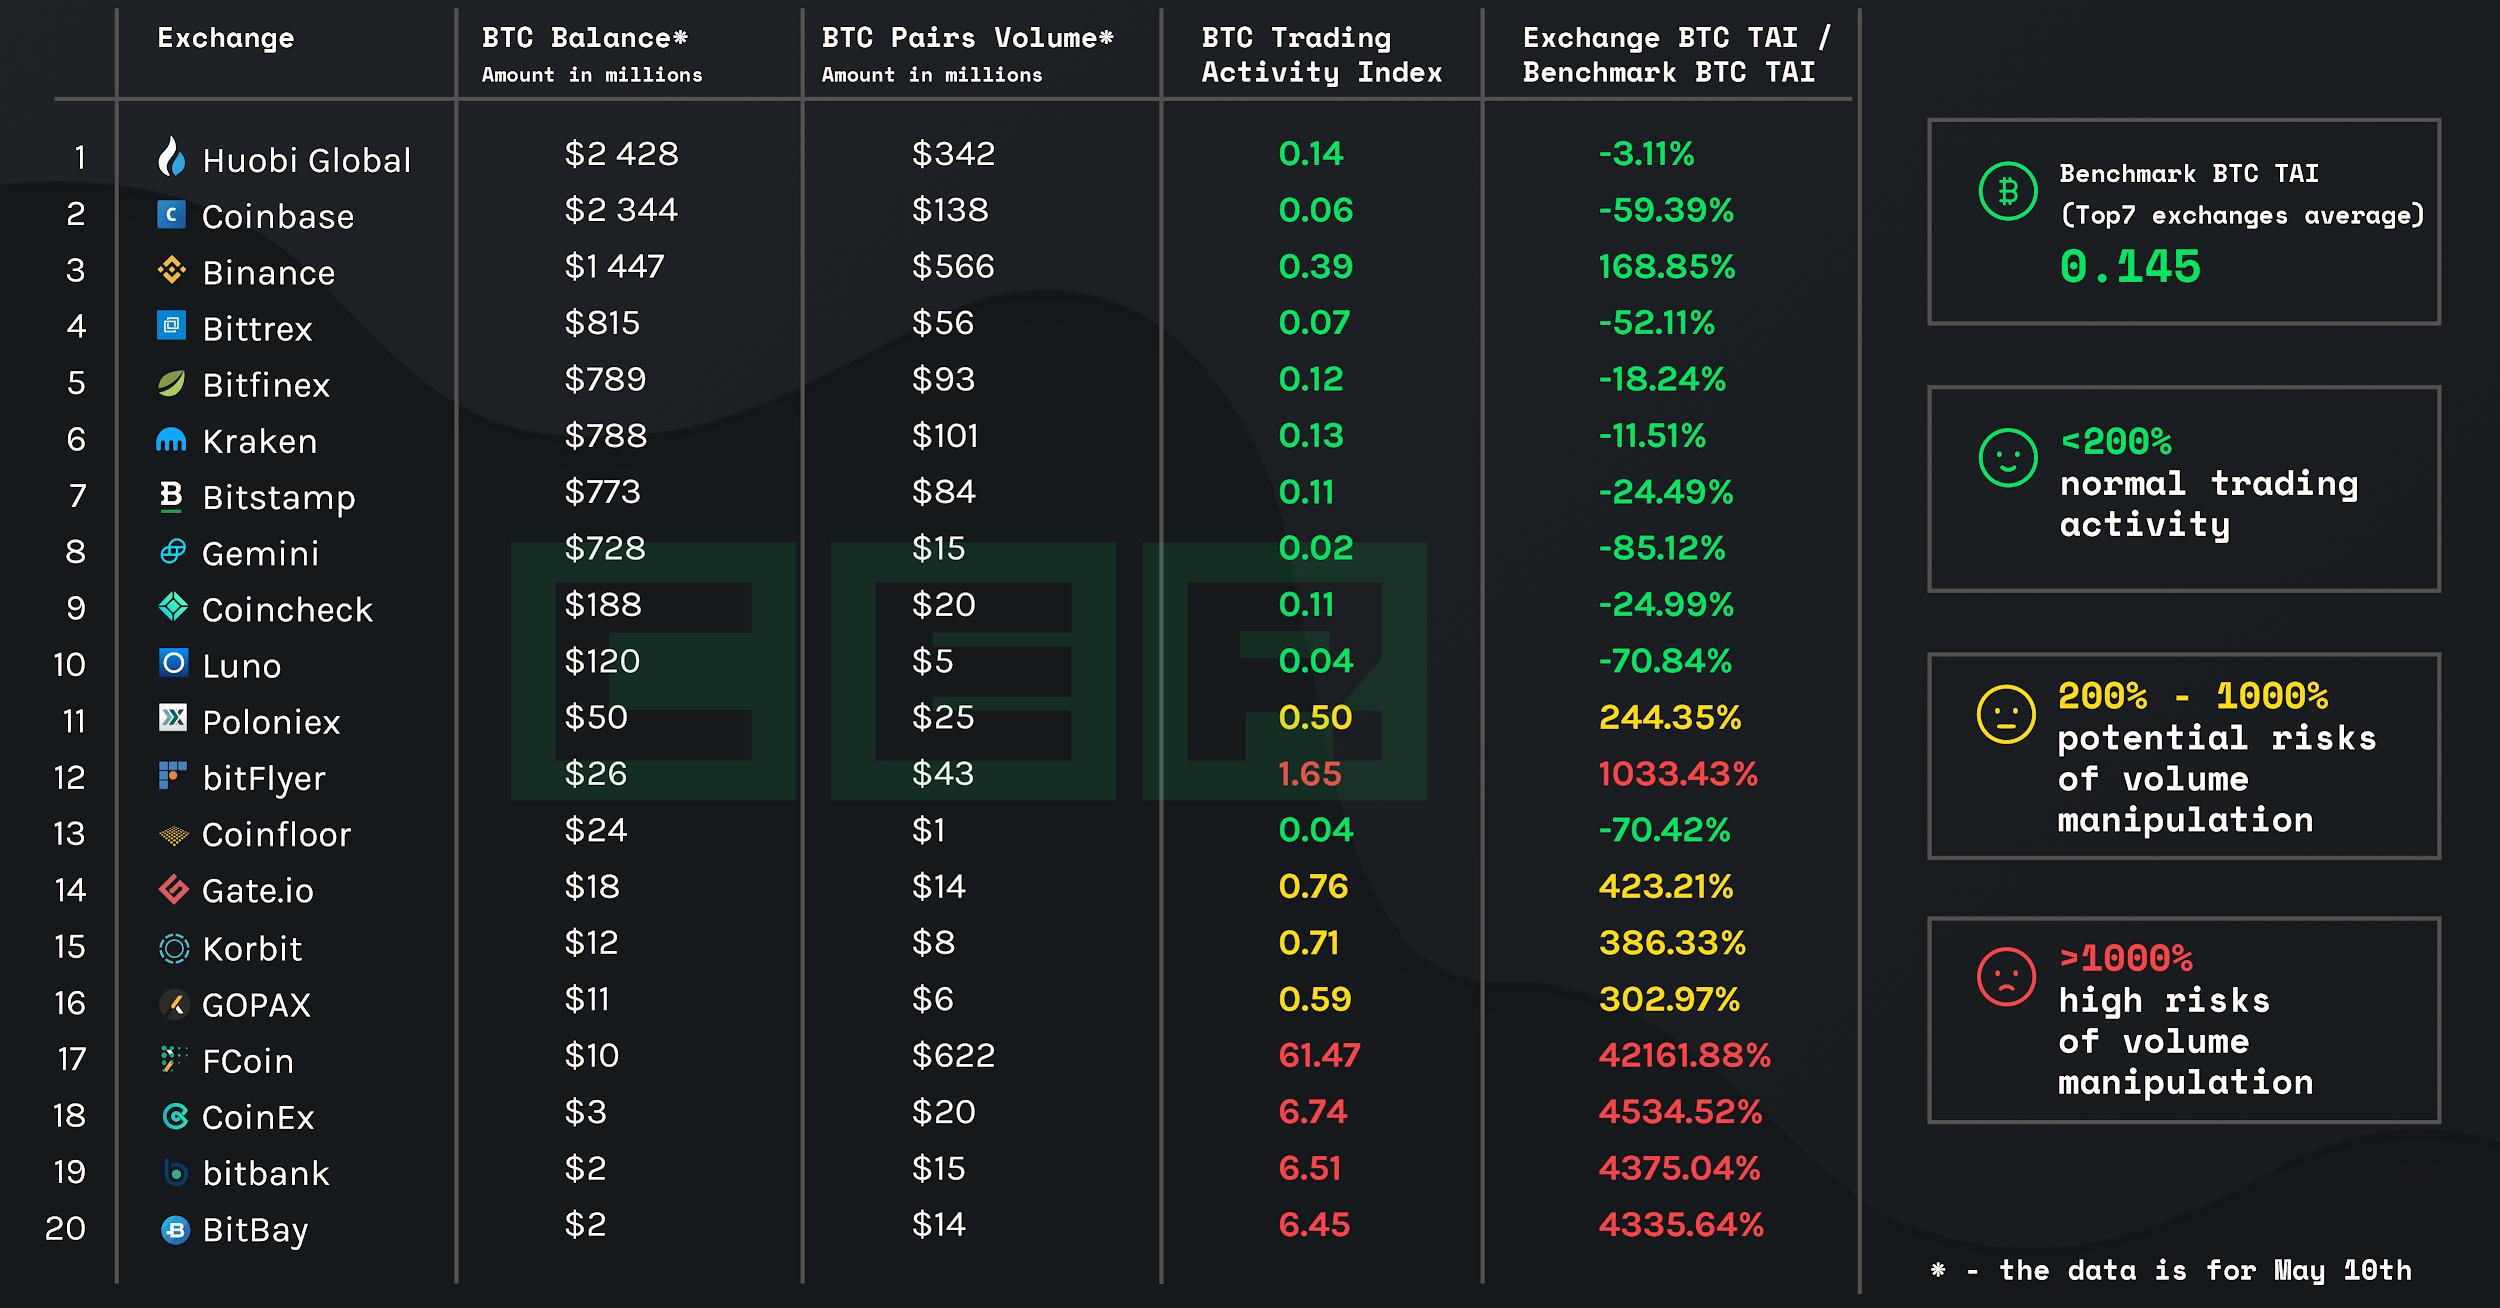 BTC Trading Activity Index - Hacken CER